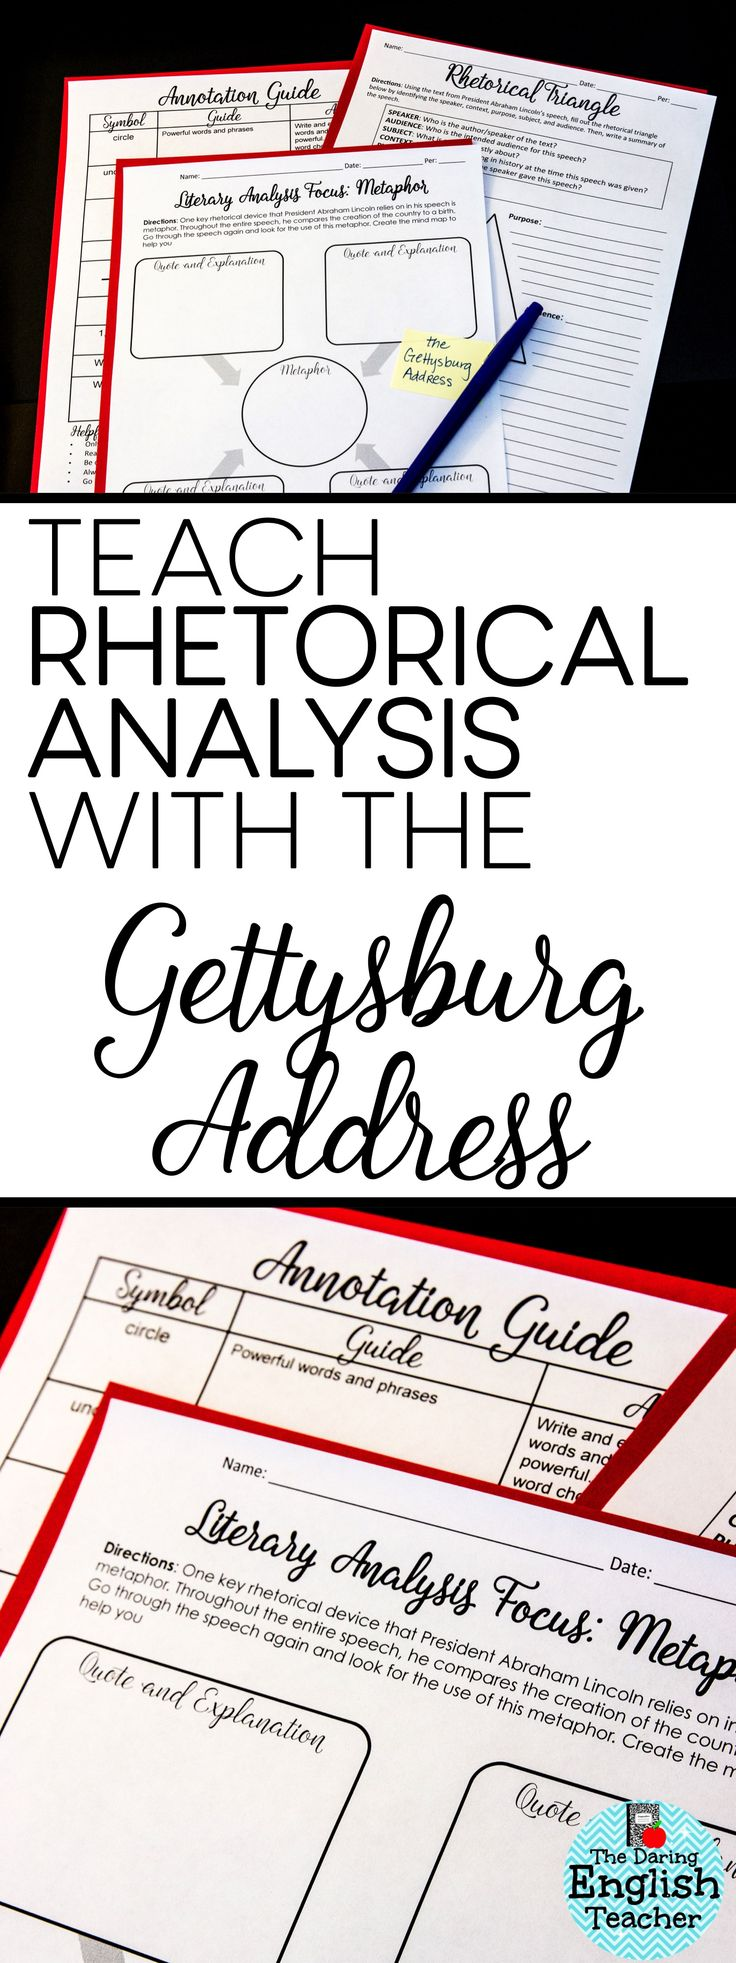 009 The Gettysburg Address Rhetorical Analysis Activity Packet